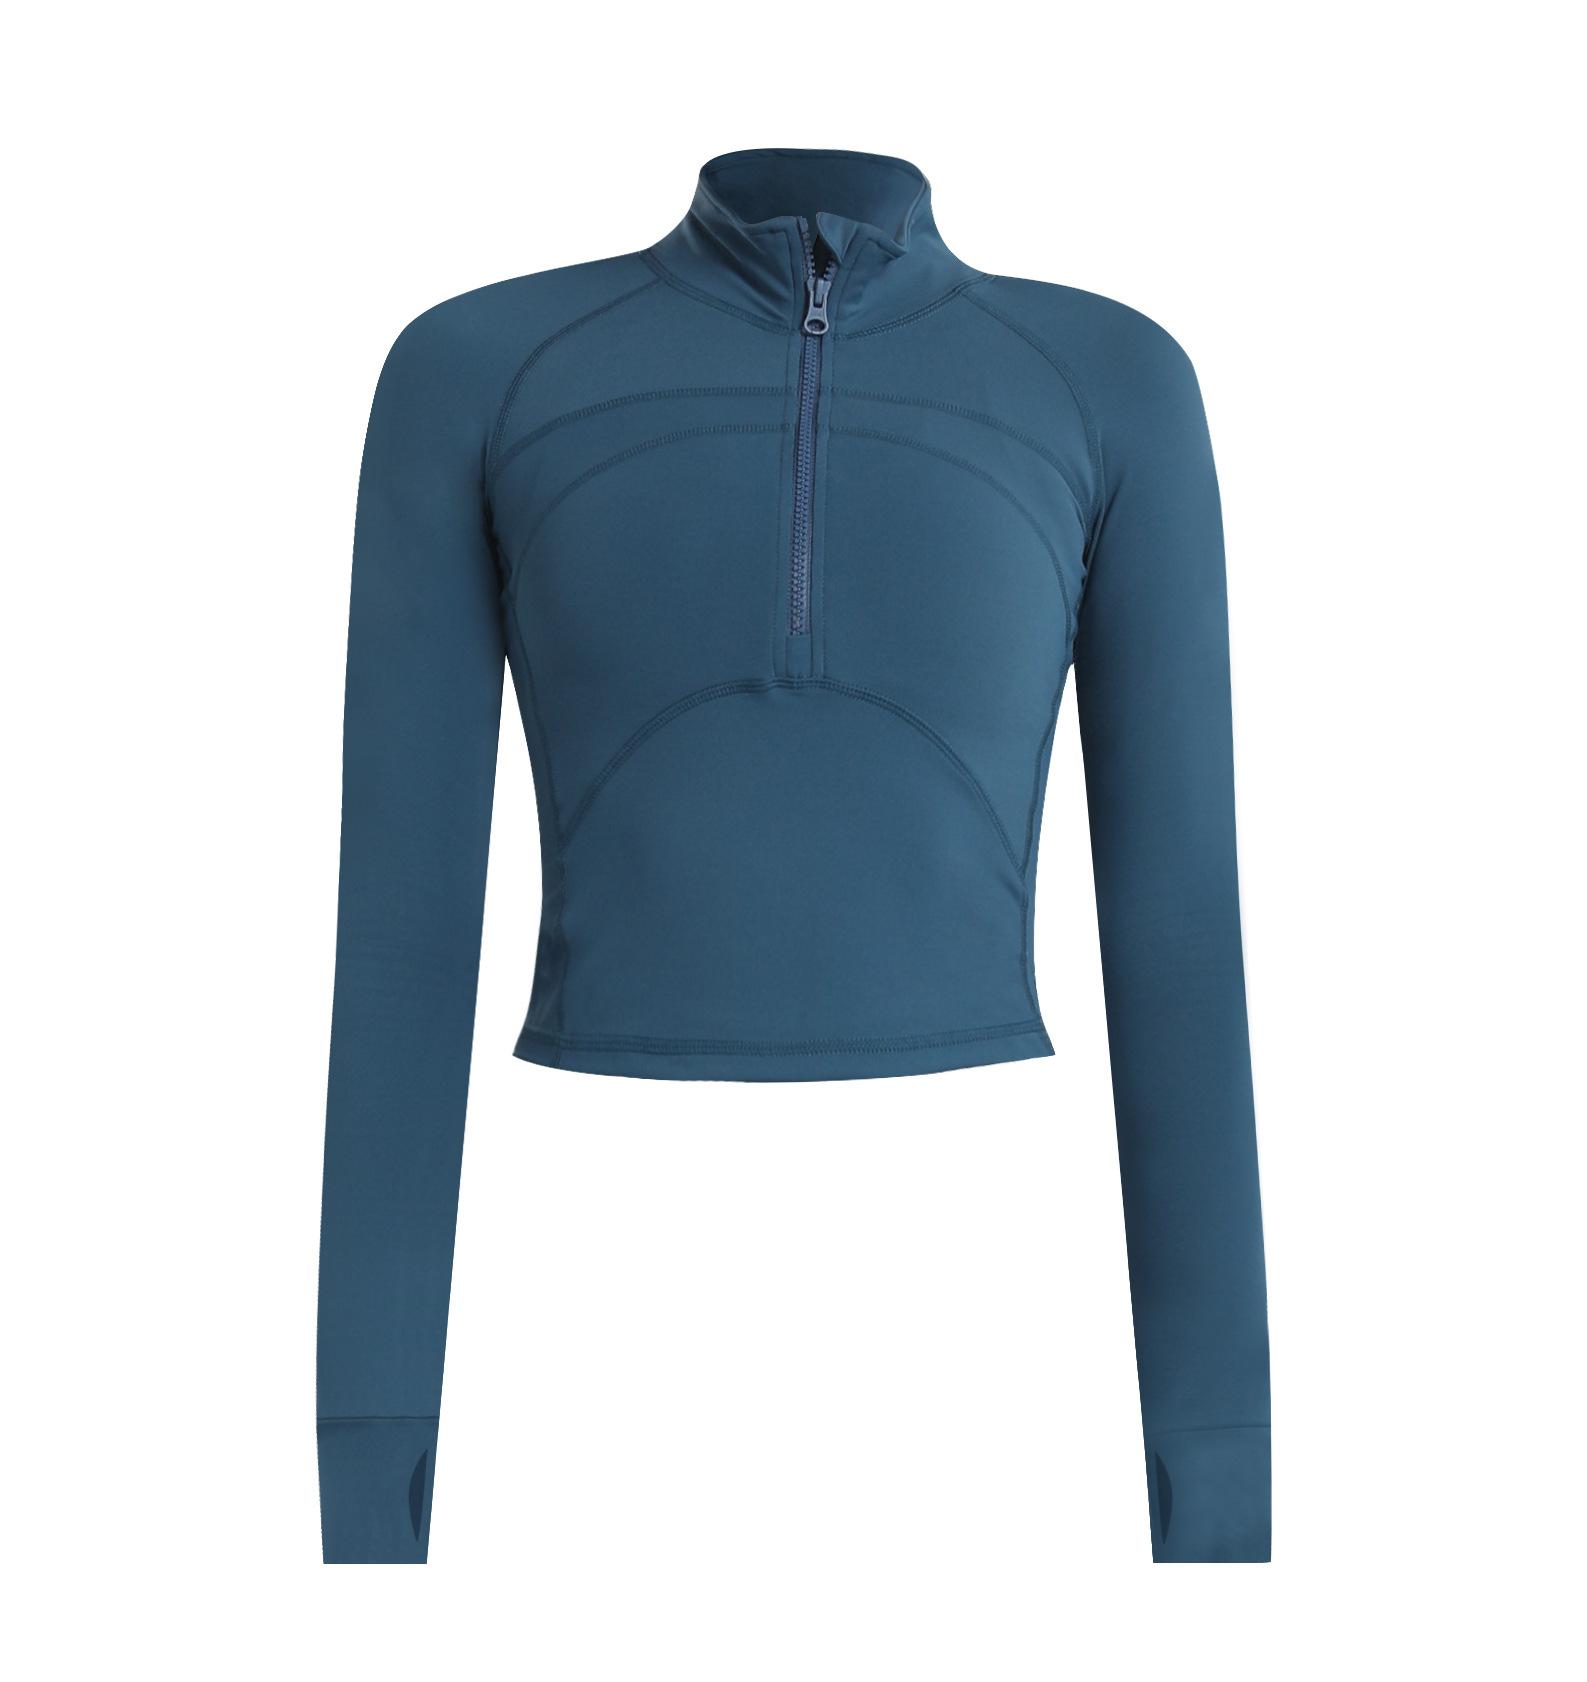 product-Half Zipper Yoga Suit Tight Stretch Quick Dry T-shirt Yoga Sport Crop Top Long Sleeve Women-